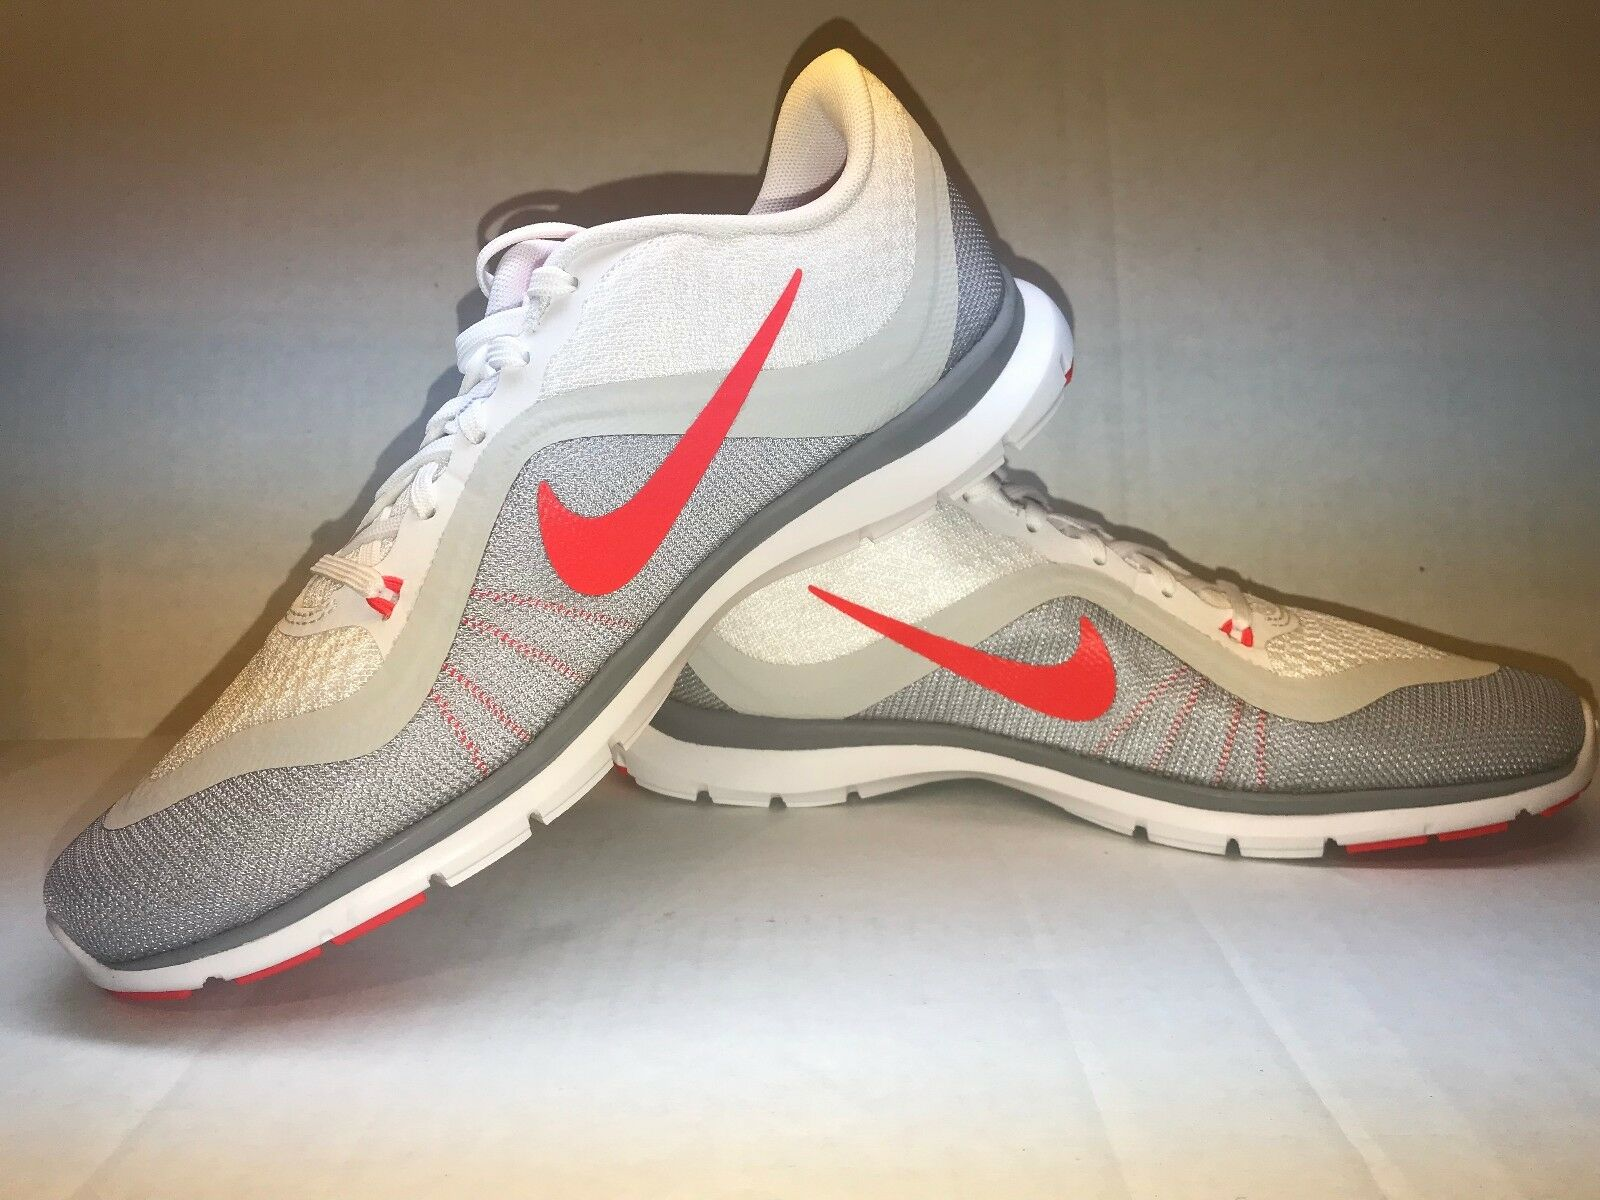 Nike Women's Flex Flex Trainer 6 Running shoes shoes shoes 831217 101 Size 8.5 63ca46